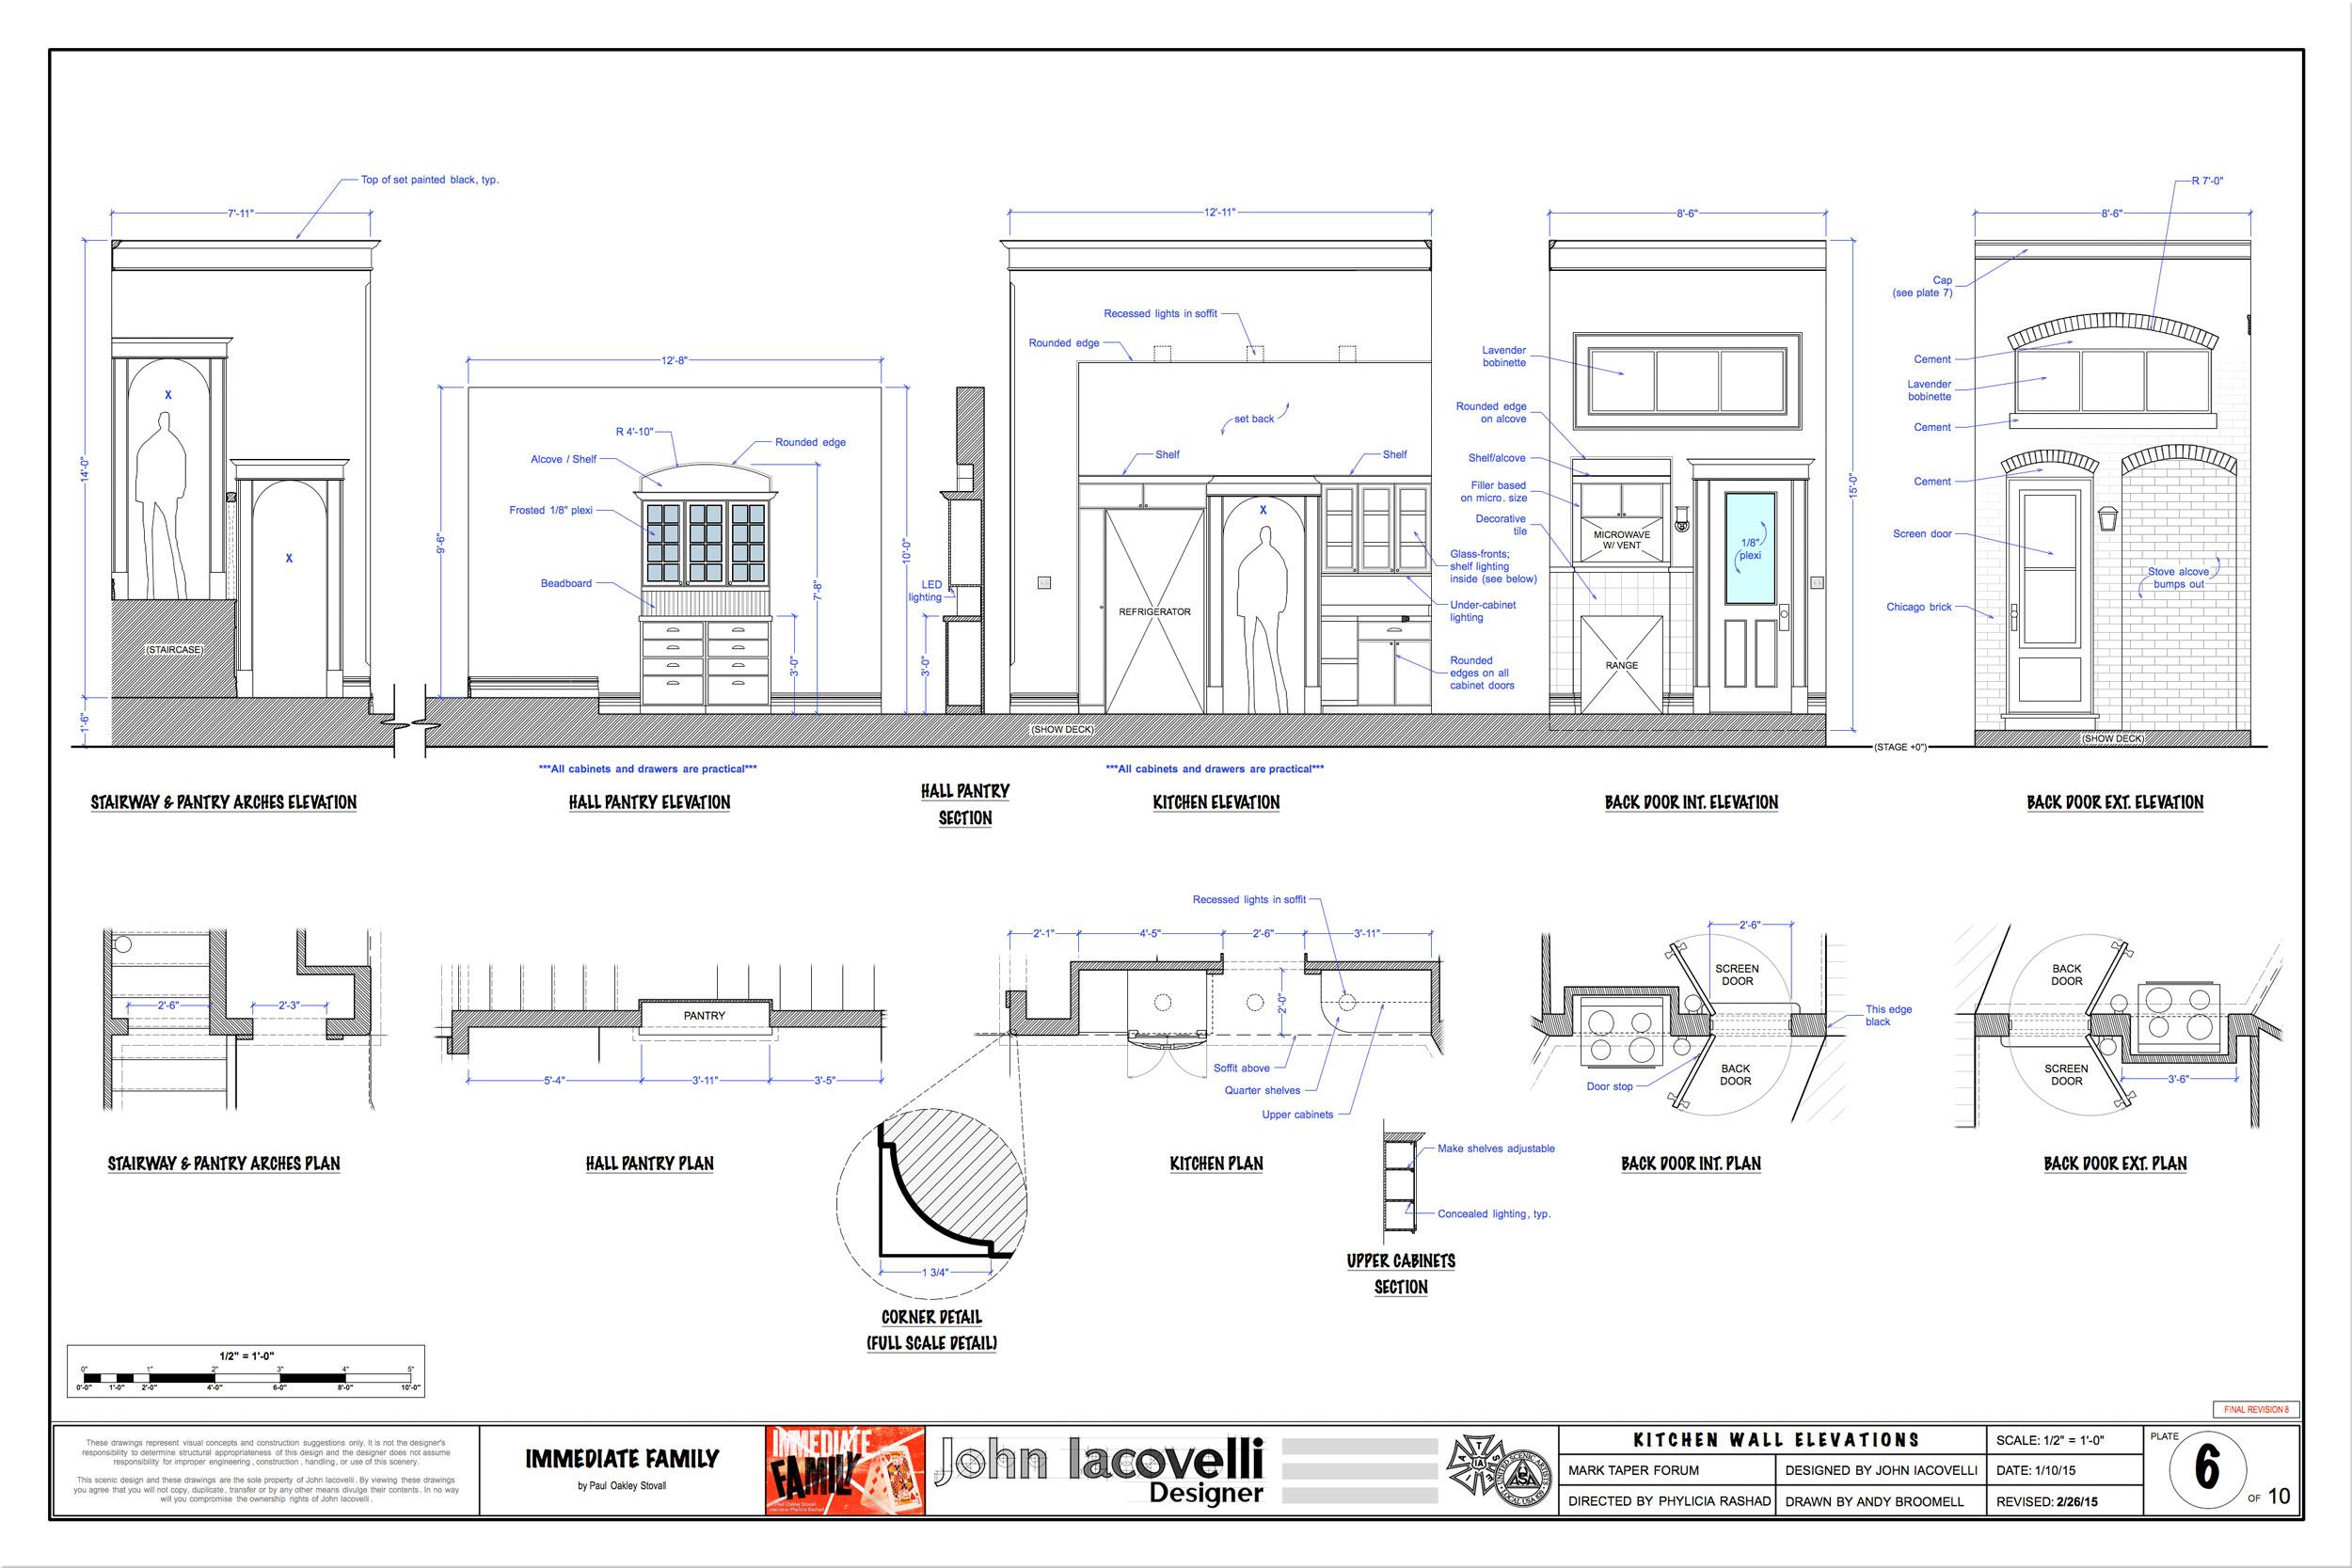 andy-broomell-scenic-design-drafting-immediate-family-6-vectorworks.jpg